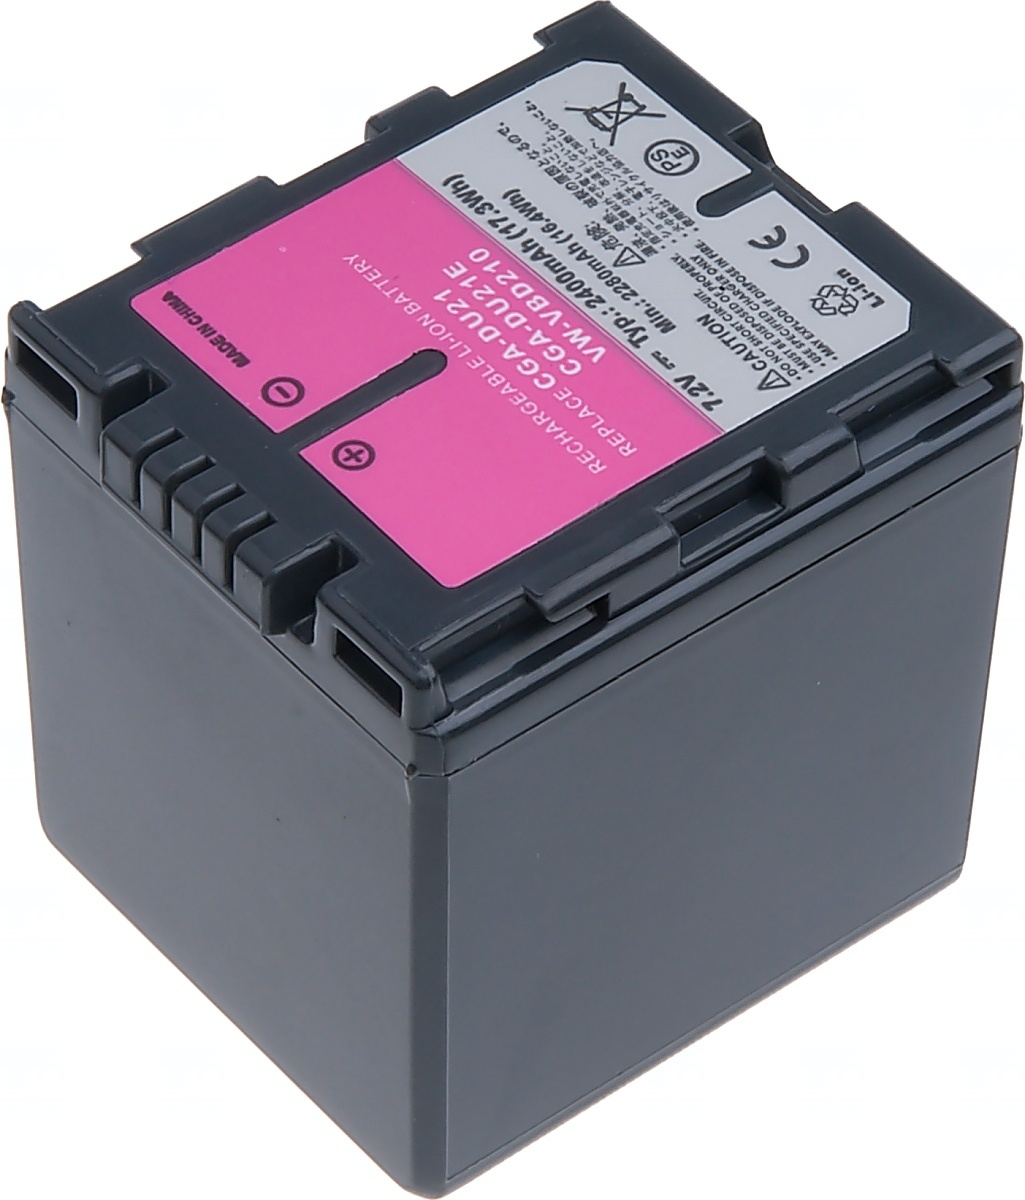 Baterie T6 power Panasonic VW-VBD210, CGA-DU21, Hitachi DZ-BP14SW, 2400mAh, šedá (Baterie a gripy)